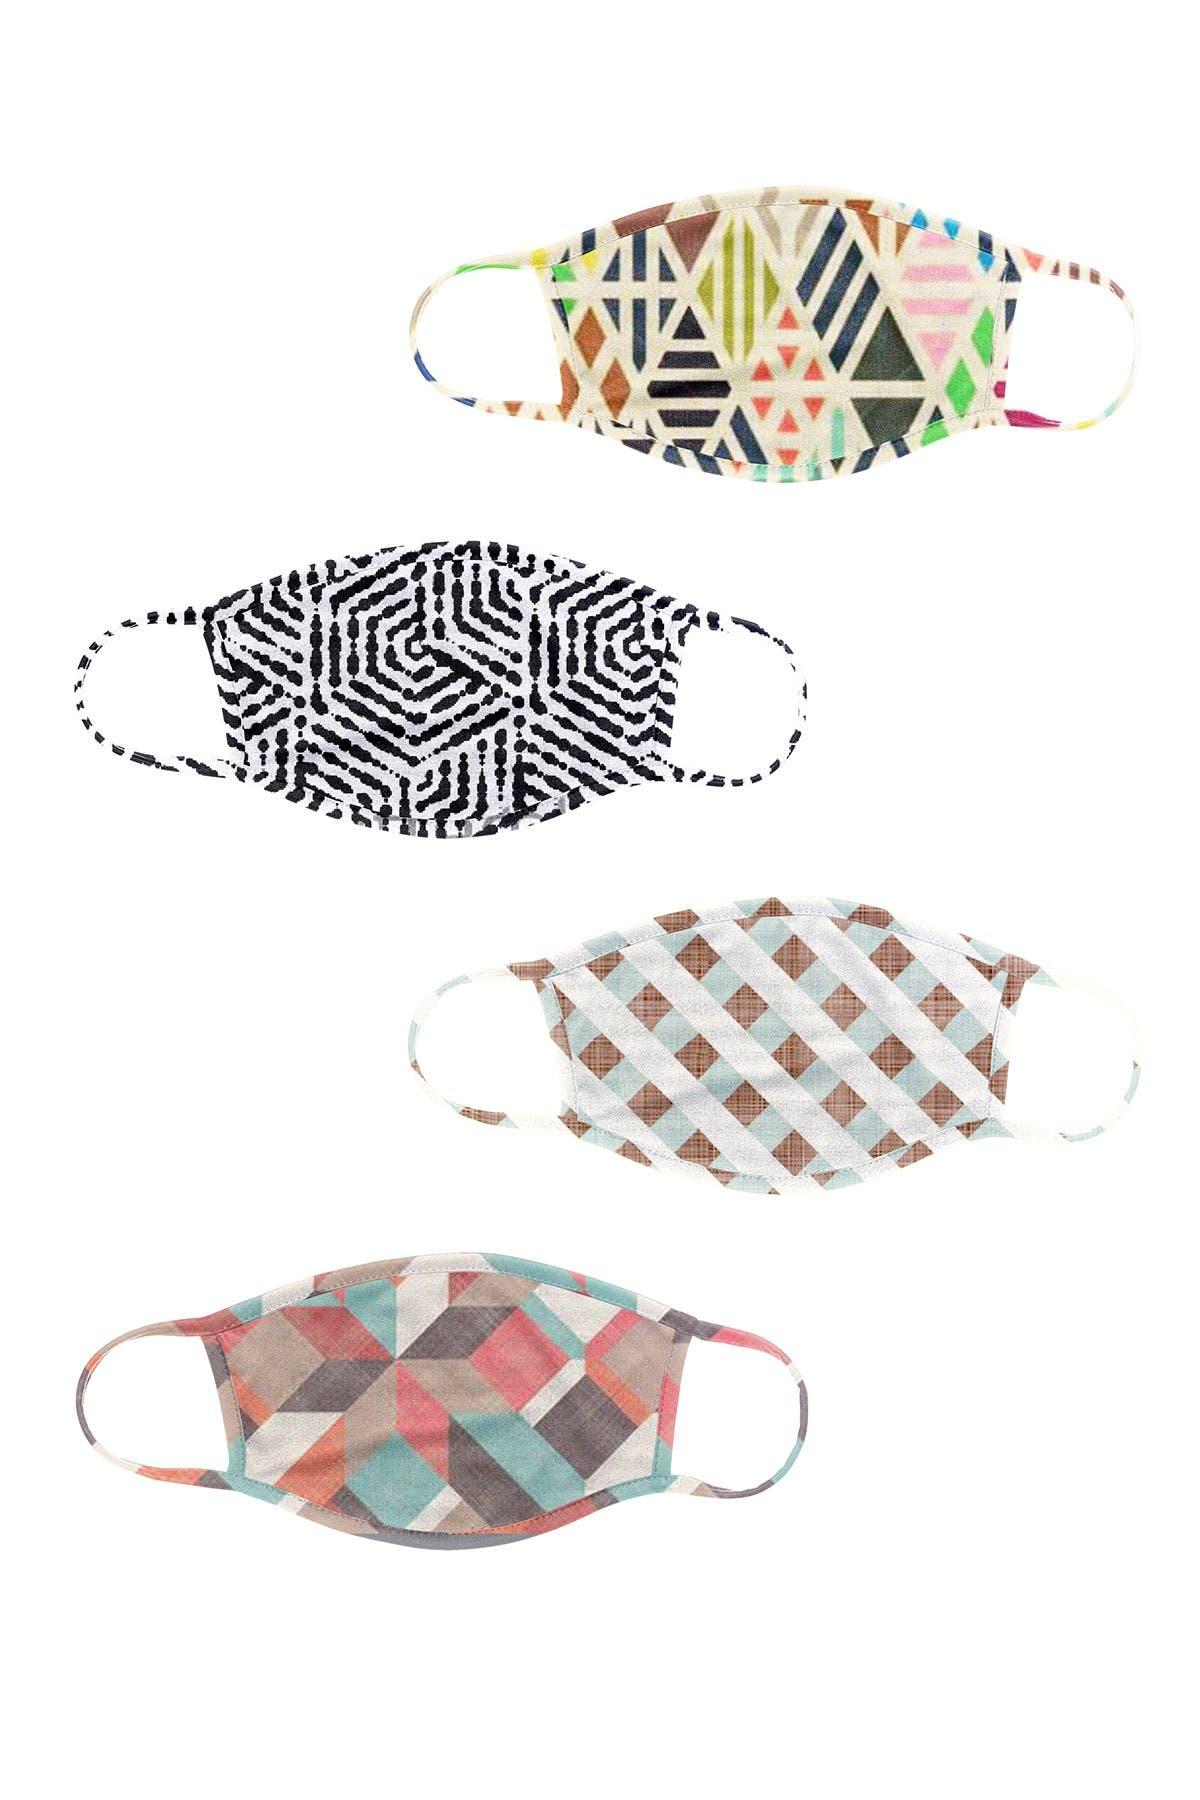 Image of Posh Mask Printed Adult Face Masks - Set of 4